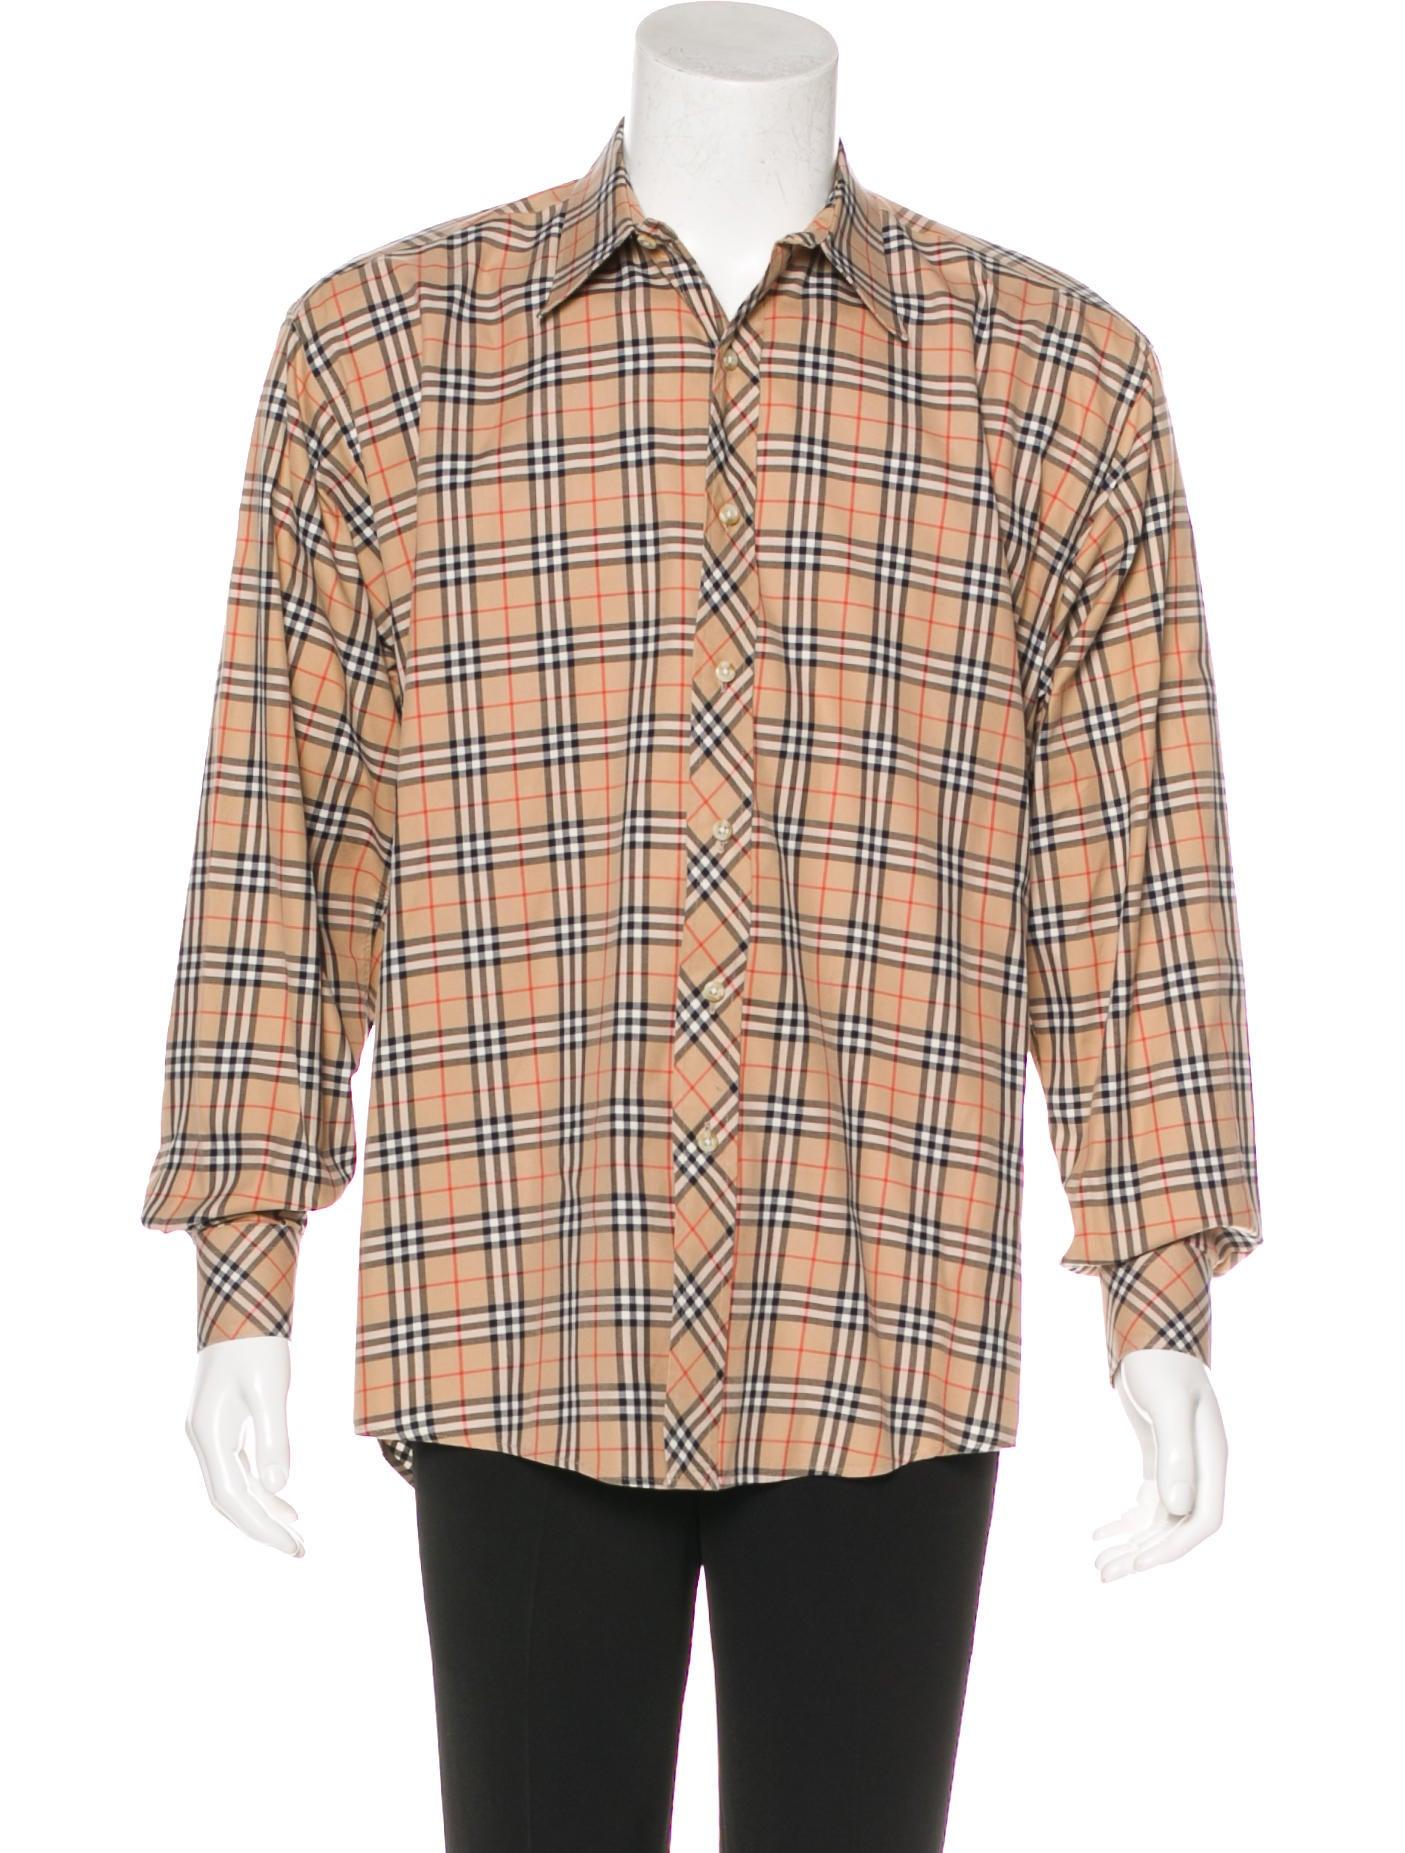 Burberry London Nova Check Woven Shirt Clothing